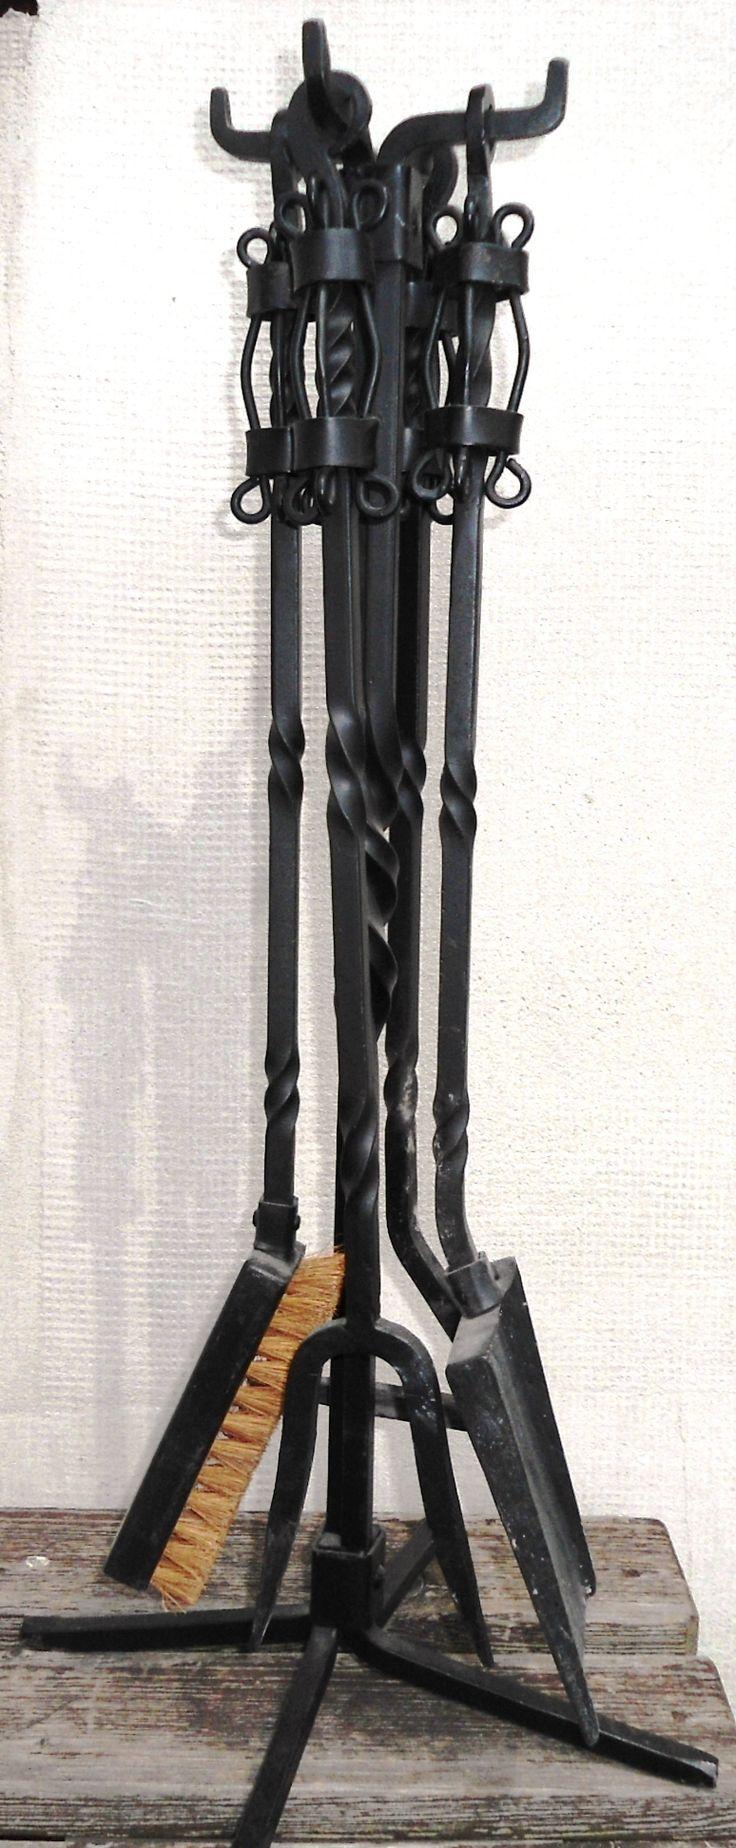 handmade fireplace tools